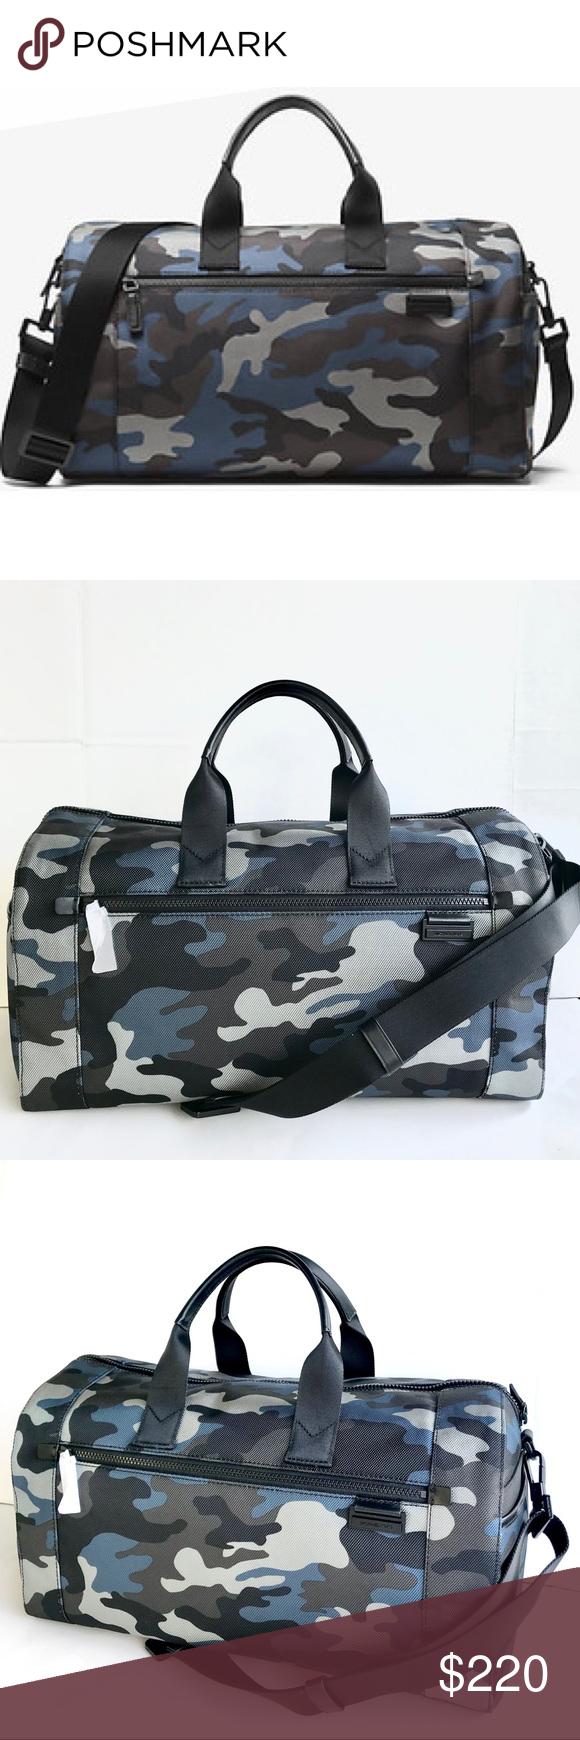 7e4dd1553efc New authentic MK Men s Duffle bag NWT Michael Kors Travis Camouflage Nylon  Duffel Travel Gym Bag